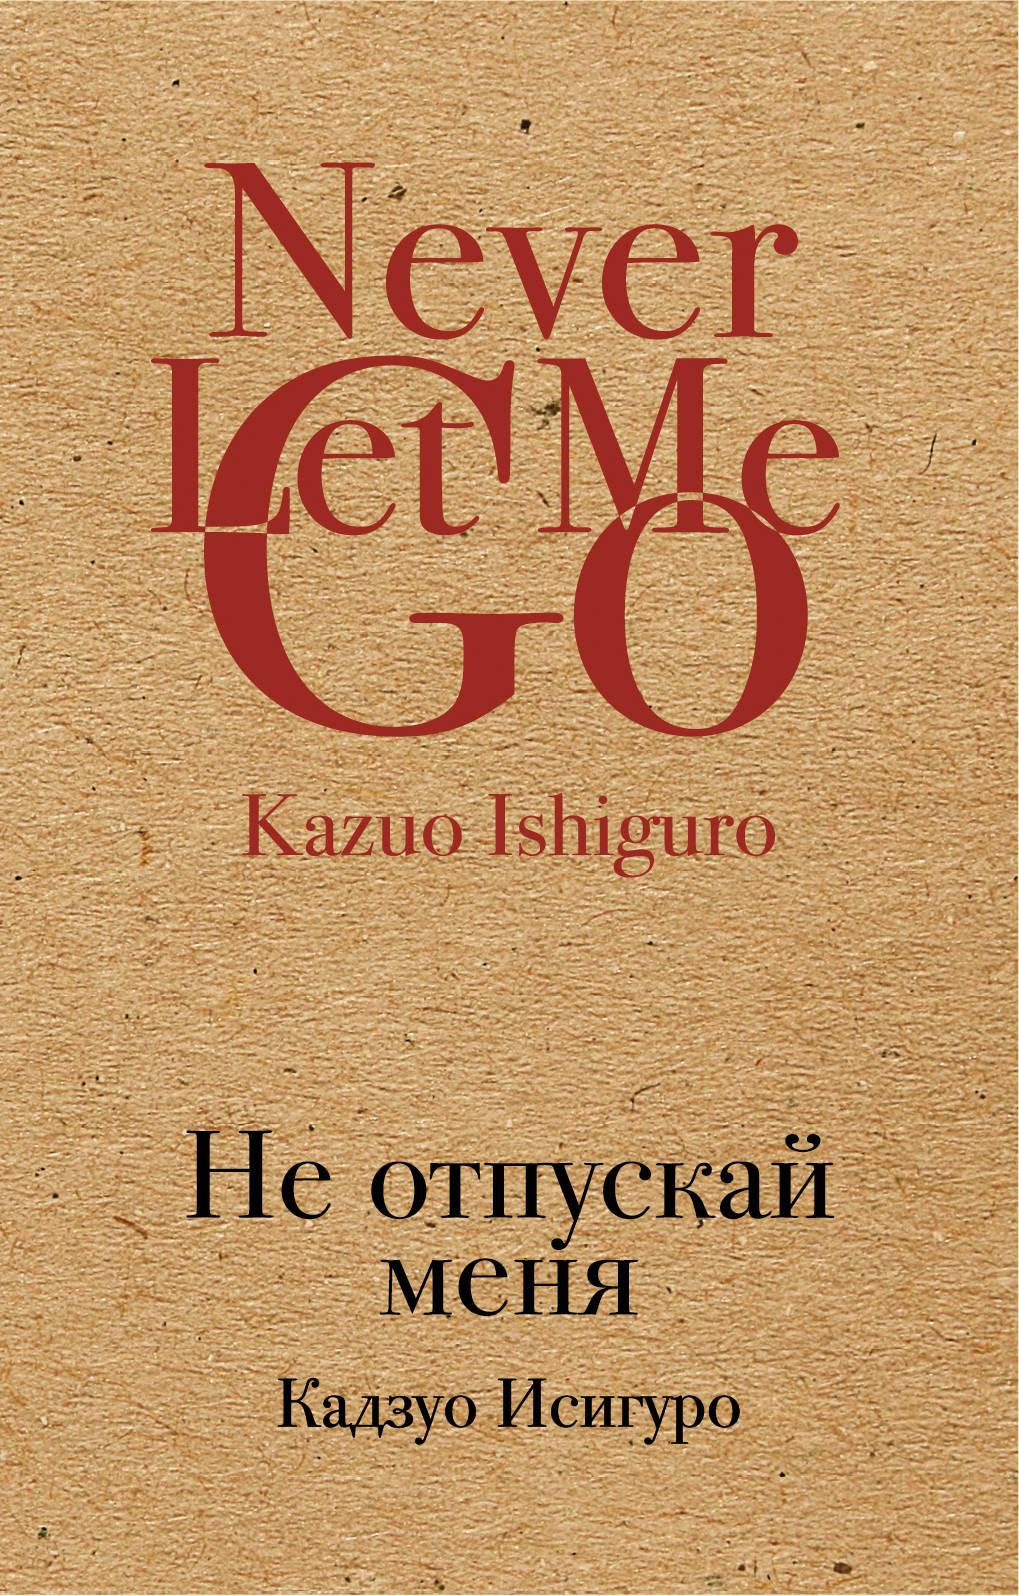 Kazuo Ishiguro Не отпускай меня kazuo ishiguro ära lase mul minna